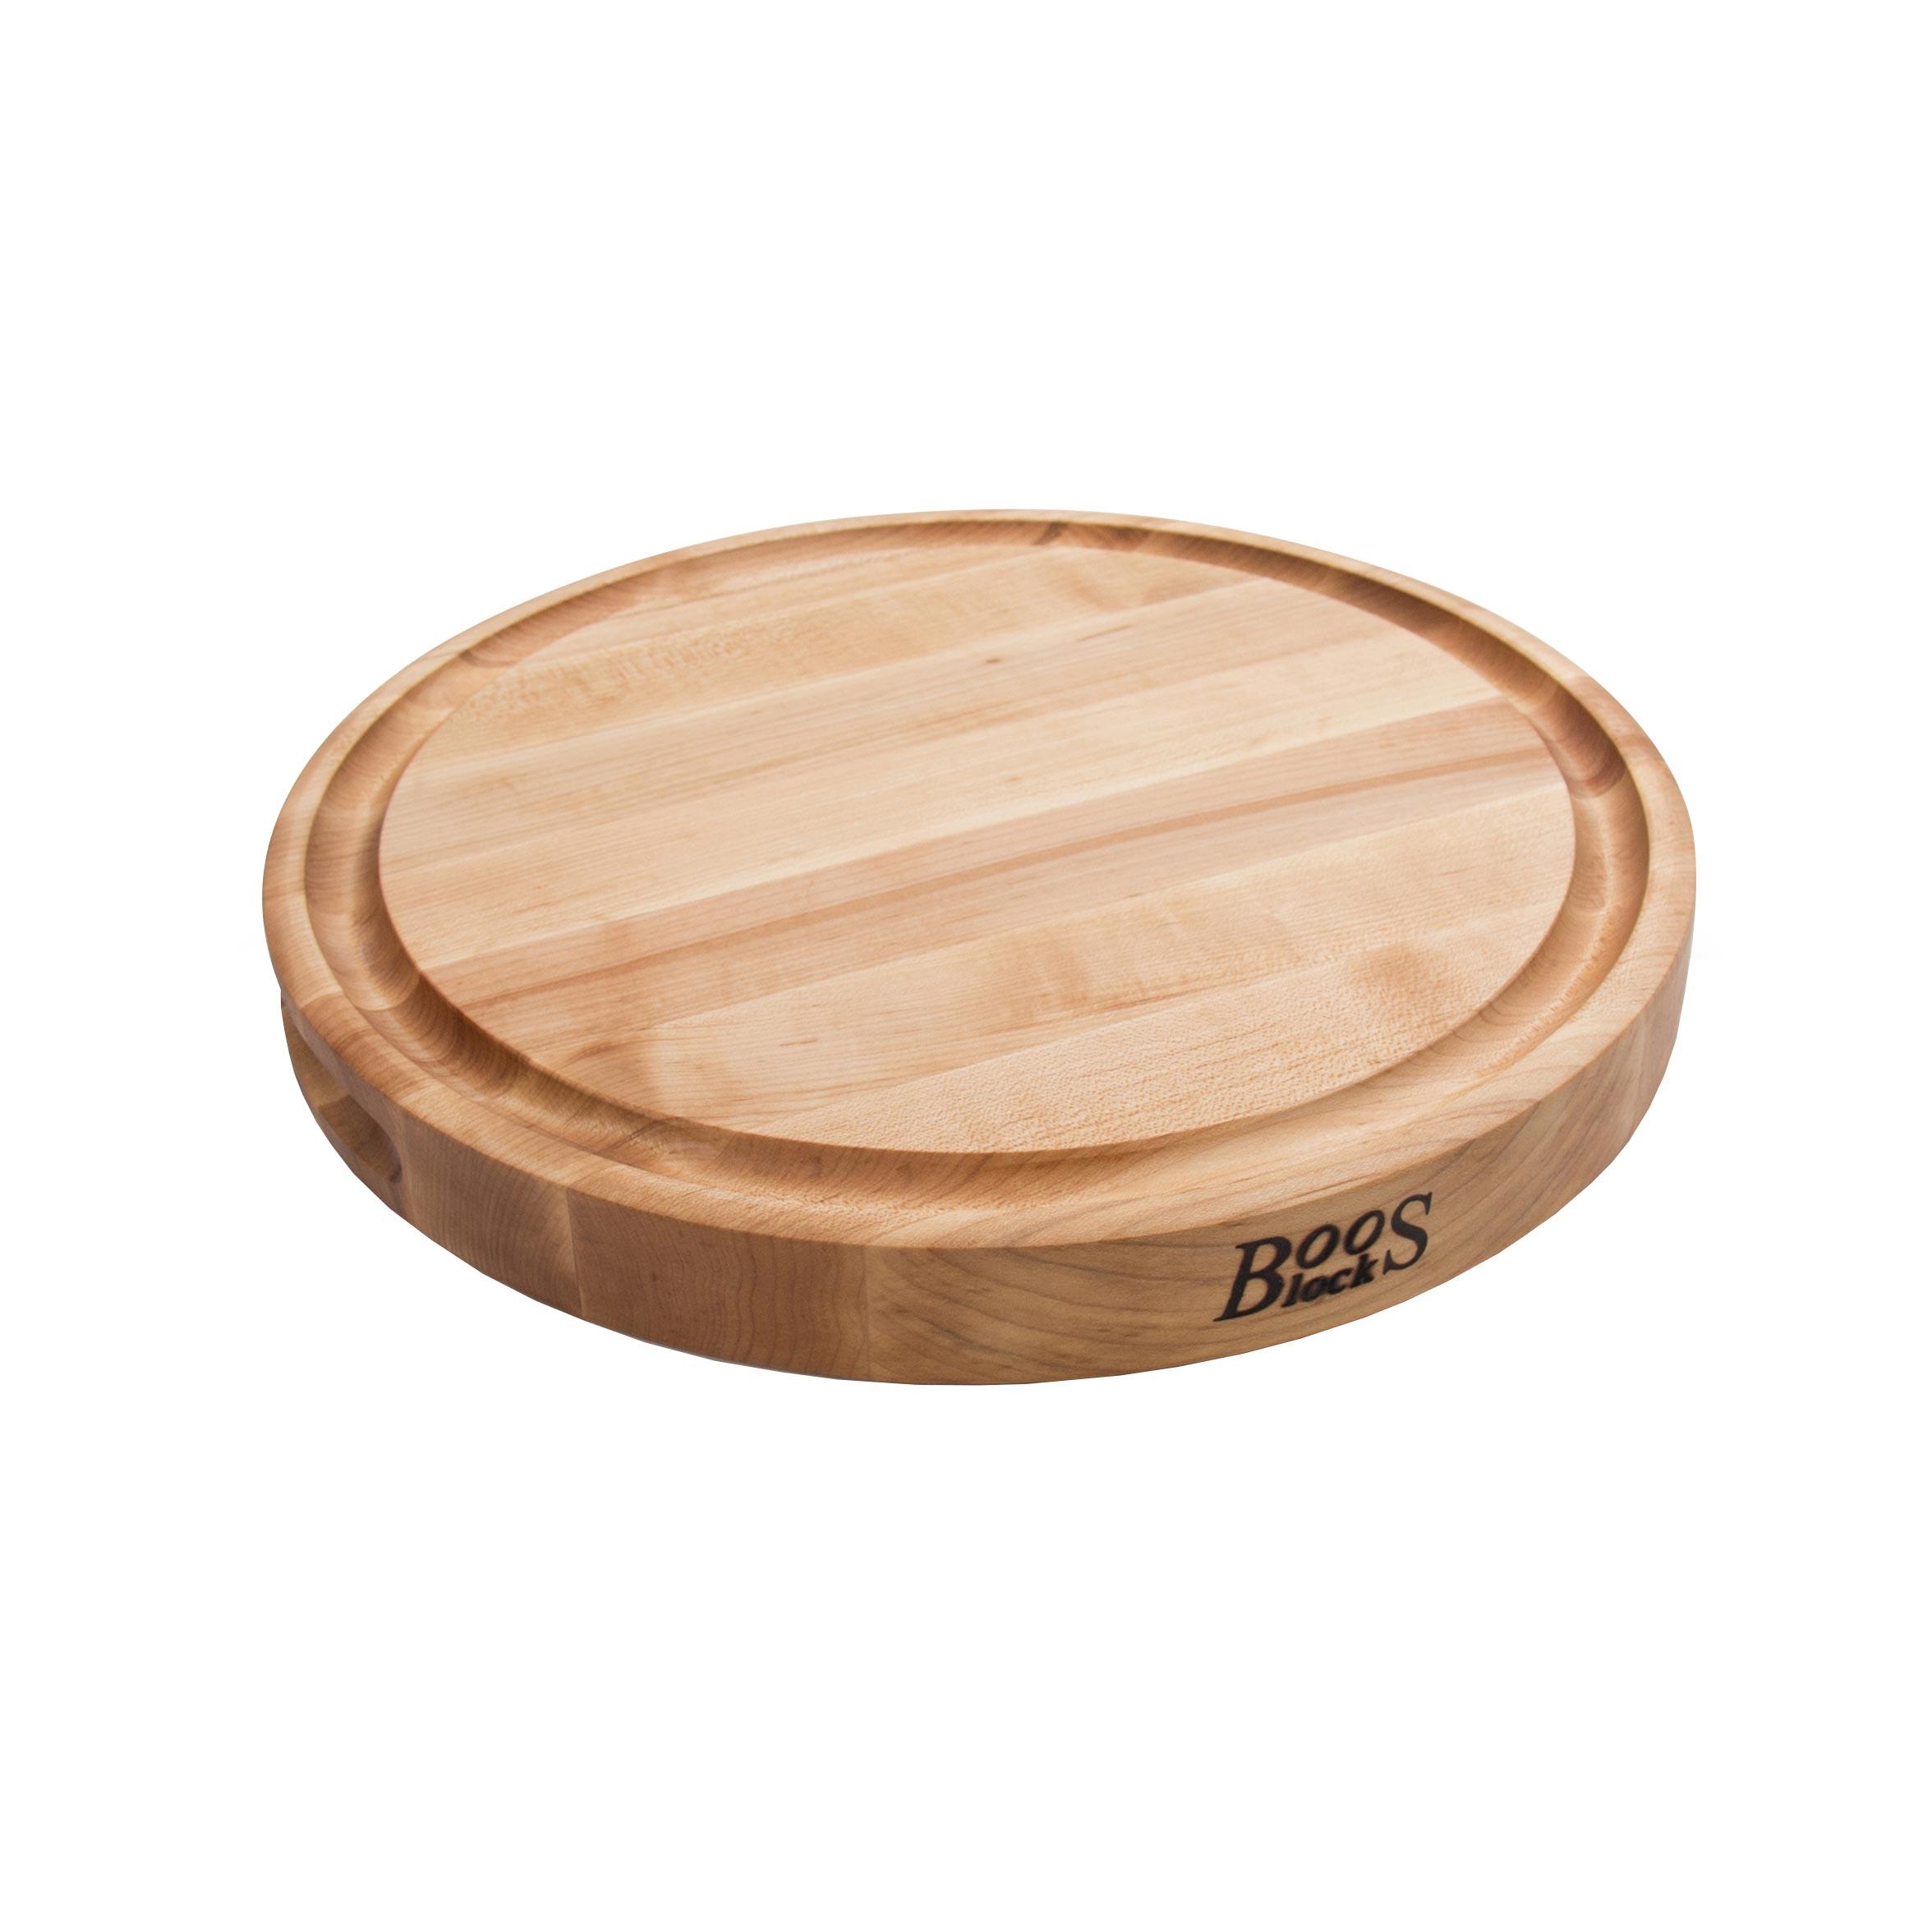 John Boos CB1051-1M1515175 cutting board, wood